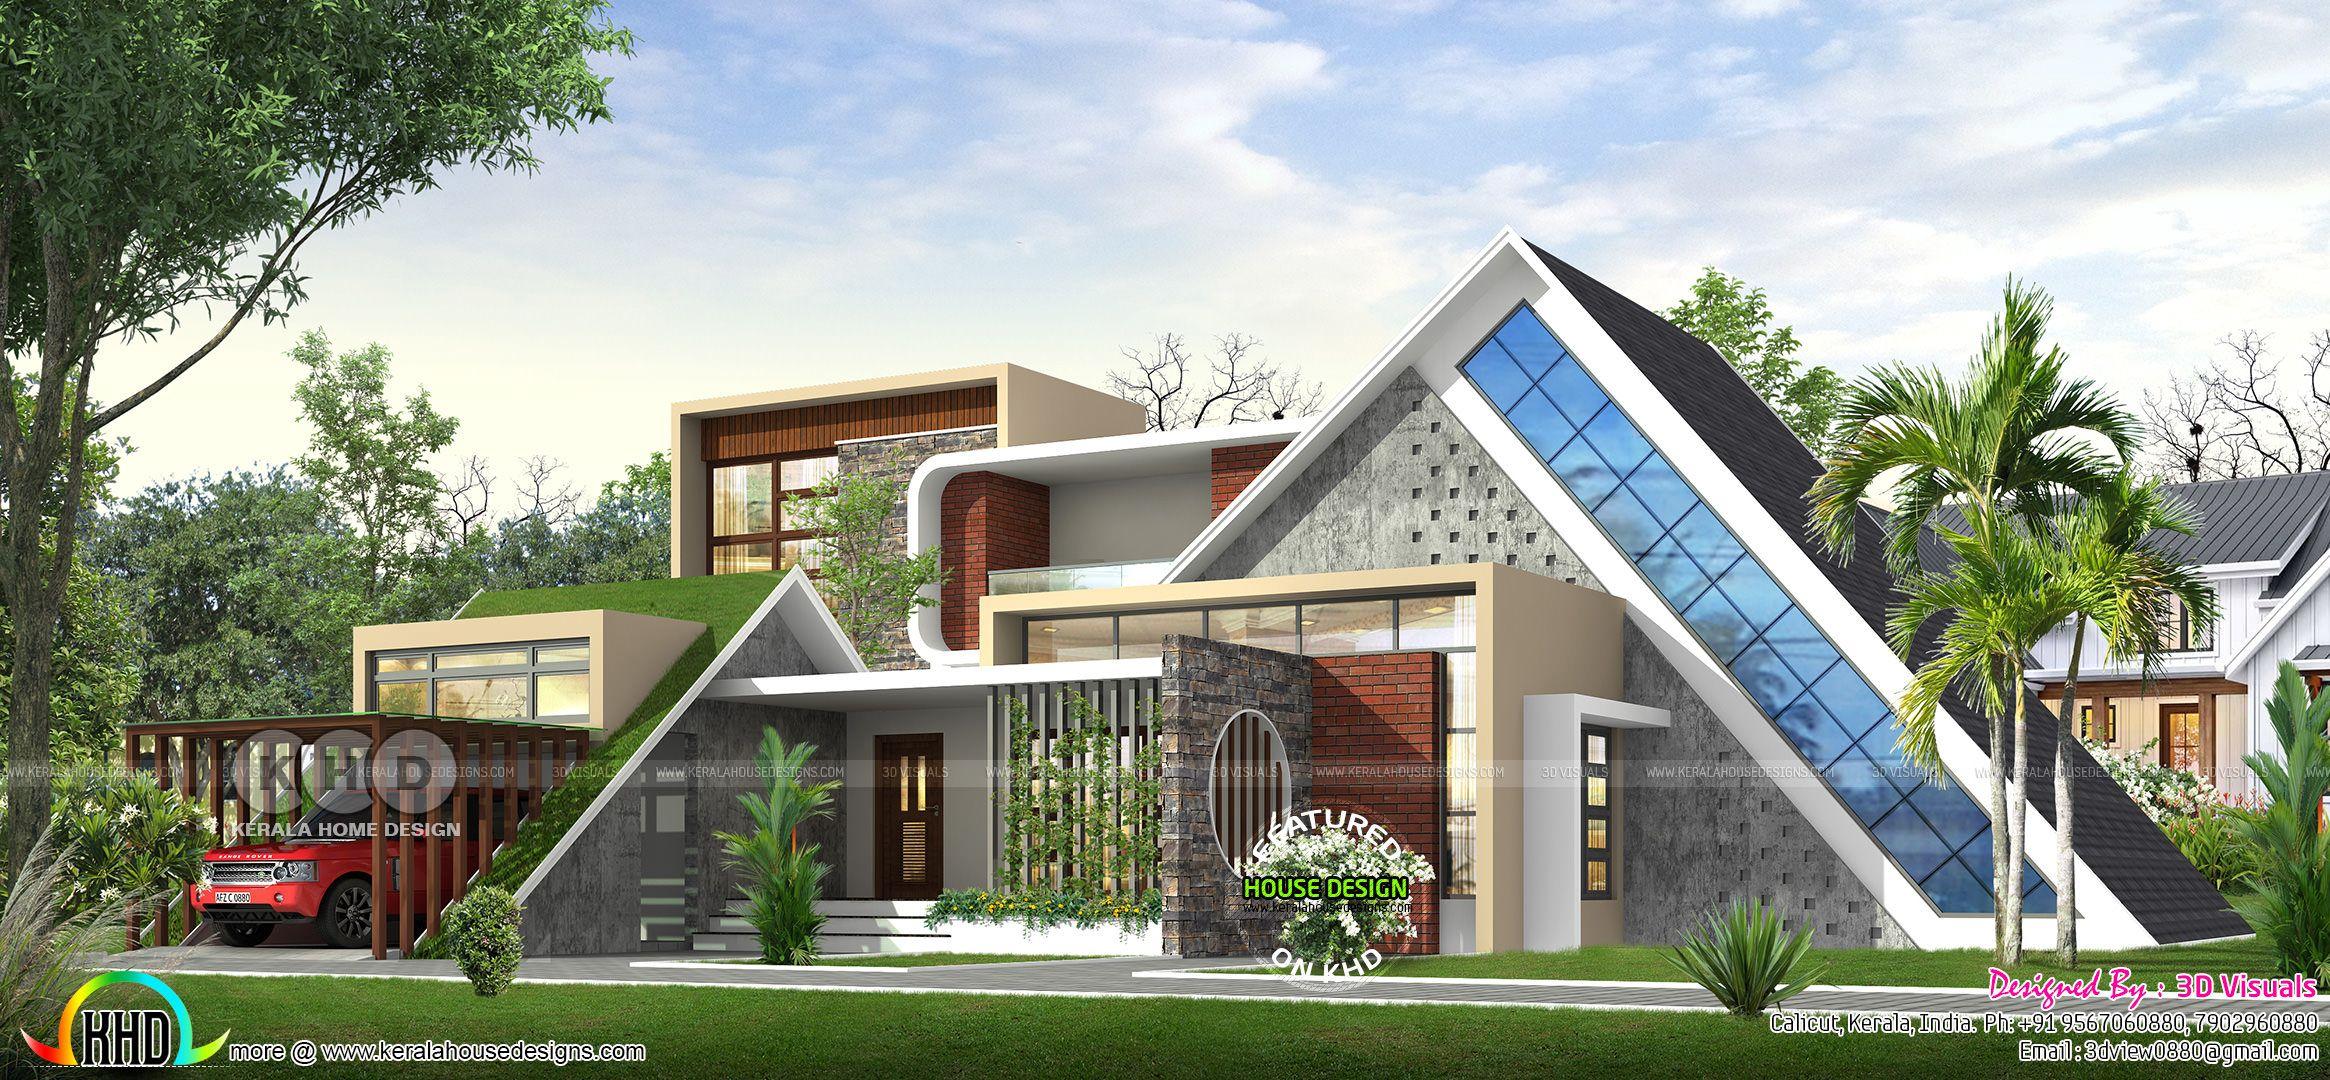 Variety design 4 bedroom ultra modern house | Duplex house ...